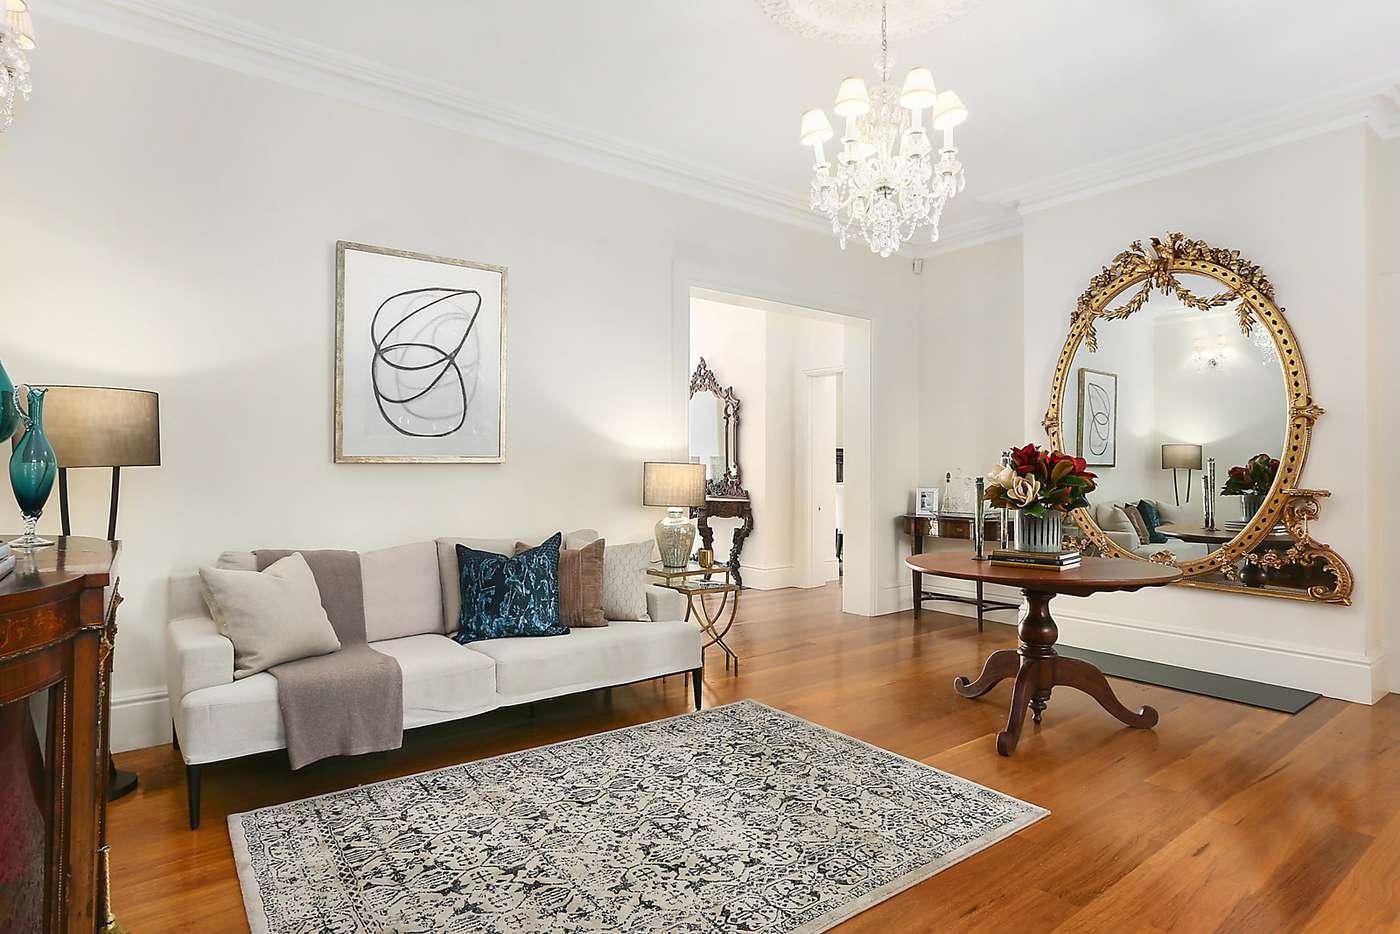 Fifth view of Homely house listing, 124-126 Paddington Street, Paddington NSW 2021